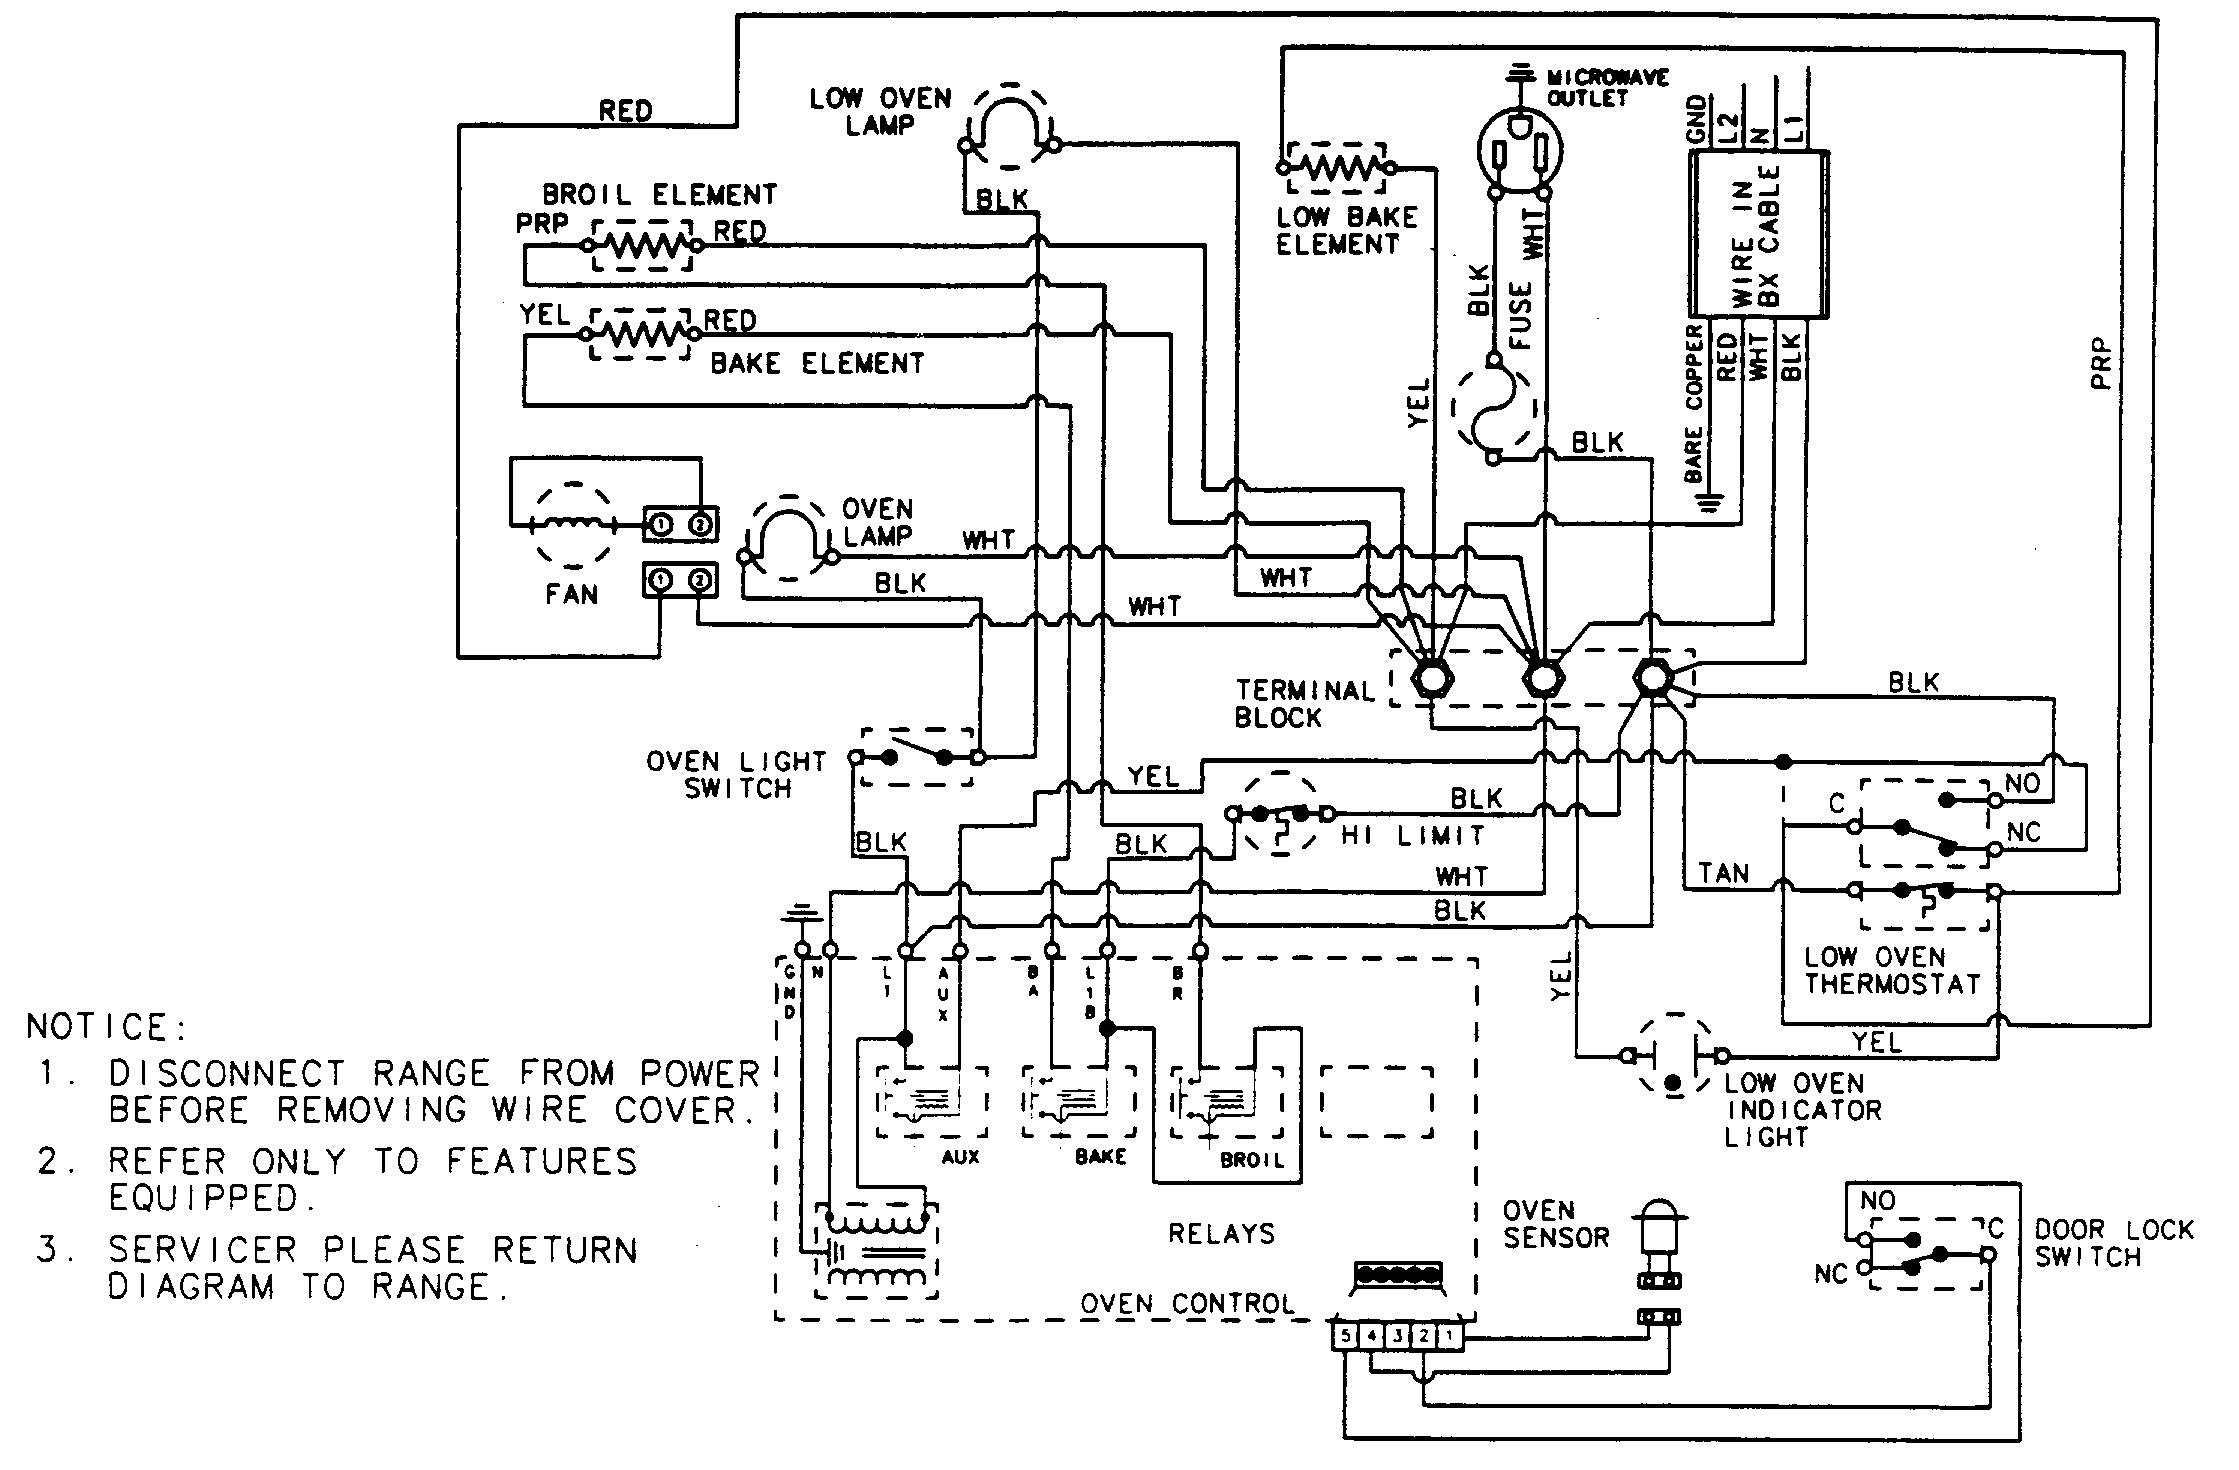 Blodgett Wiring Diagrams Sh3me Stero Dishwasher For Er44 Zephaire G Diagram